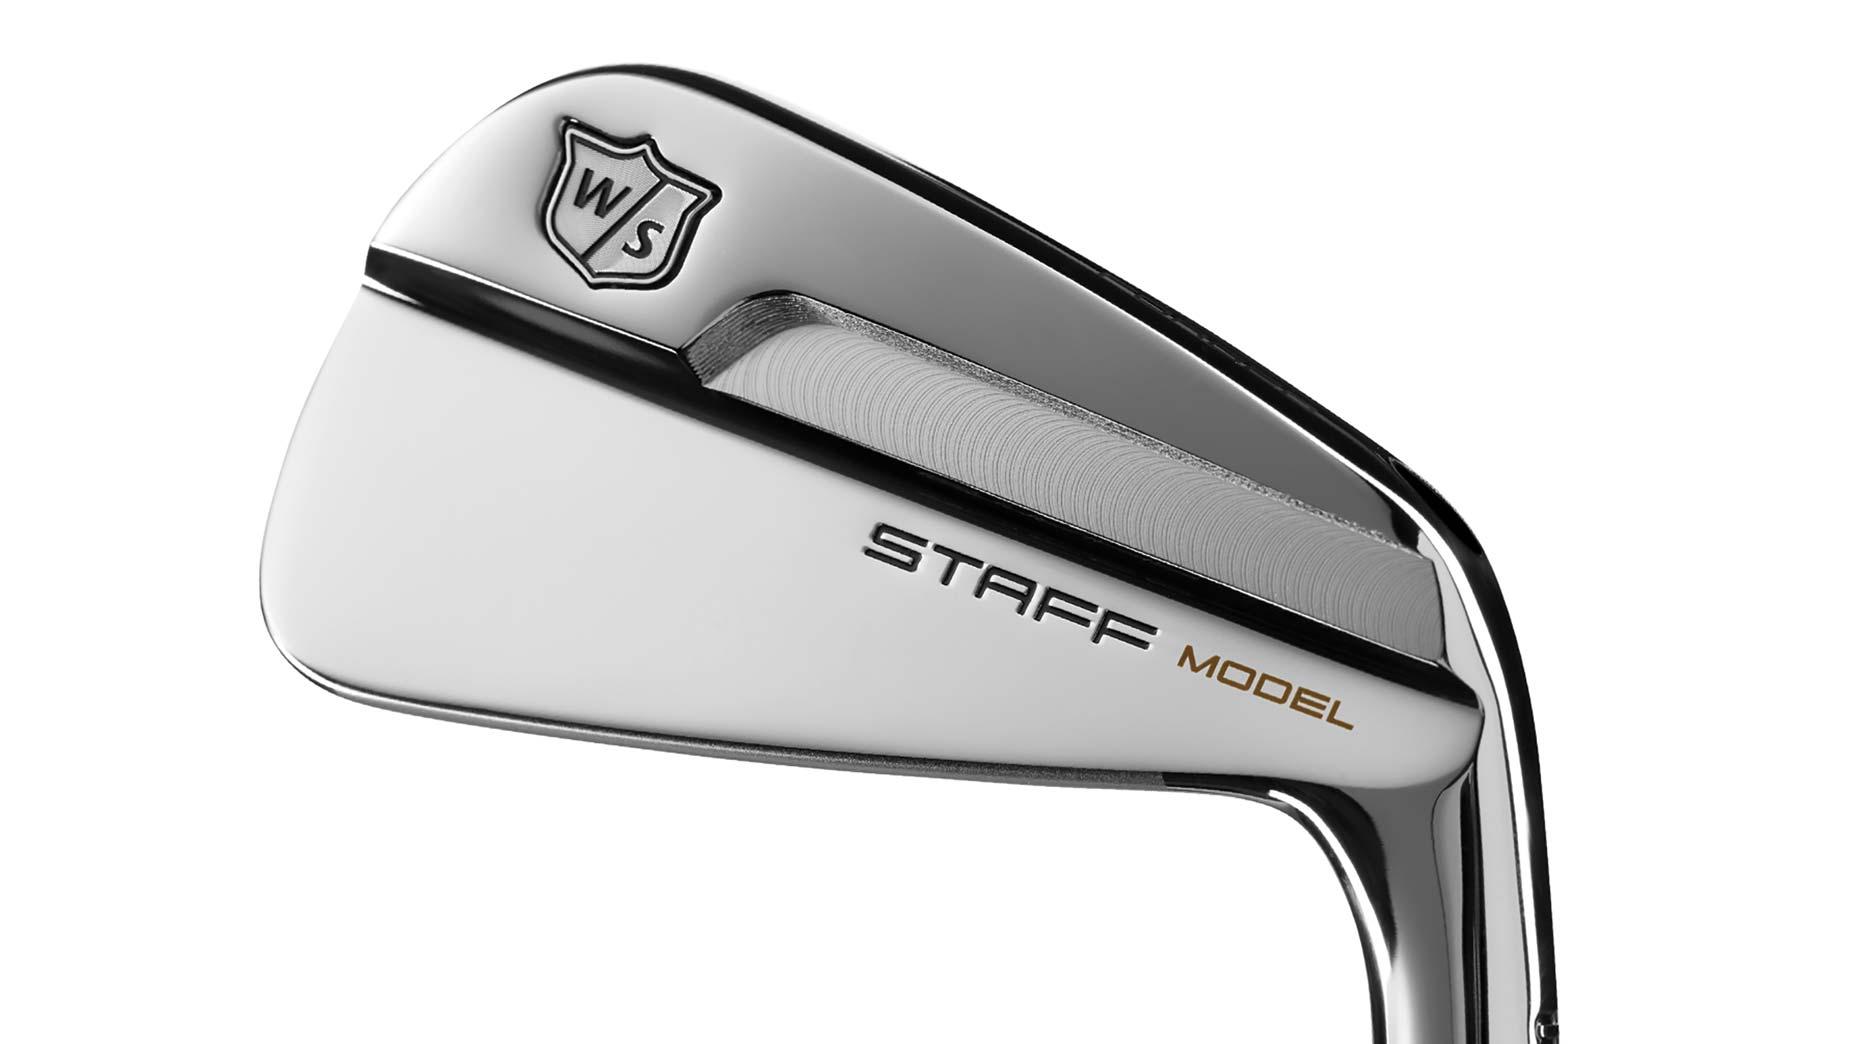 Wilson's Staff Model Blade iron